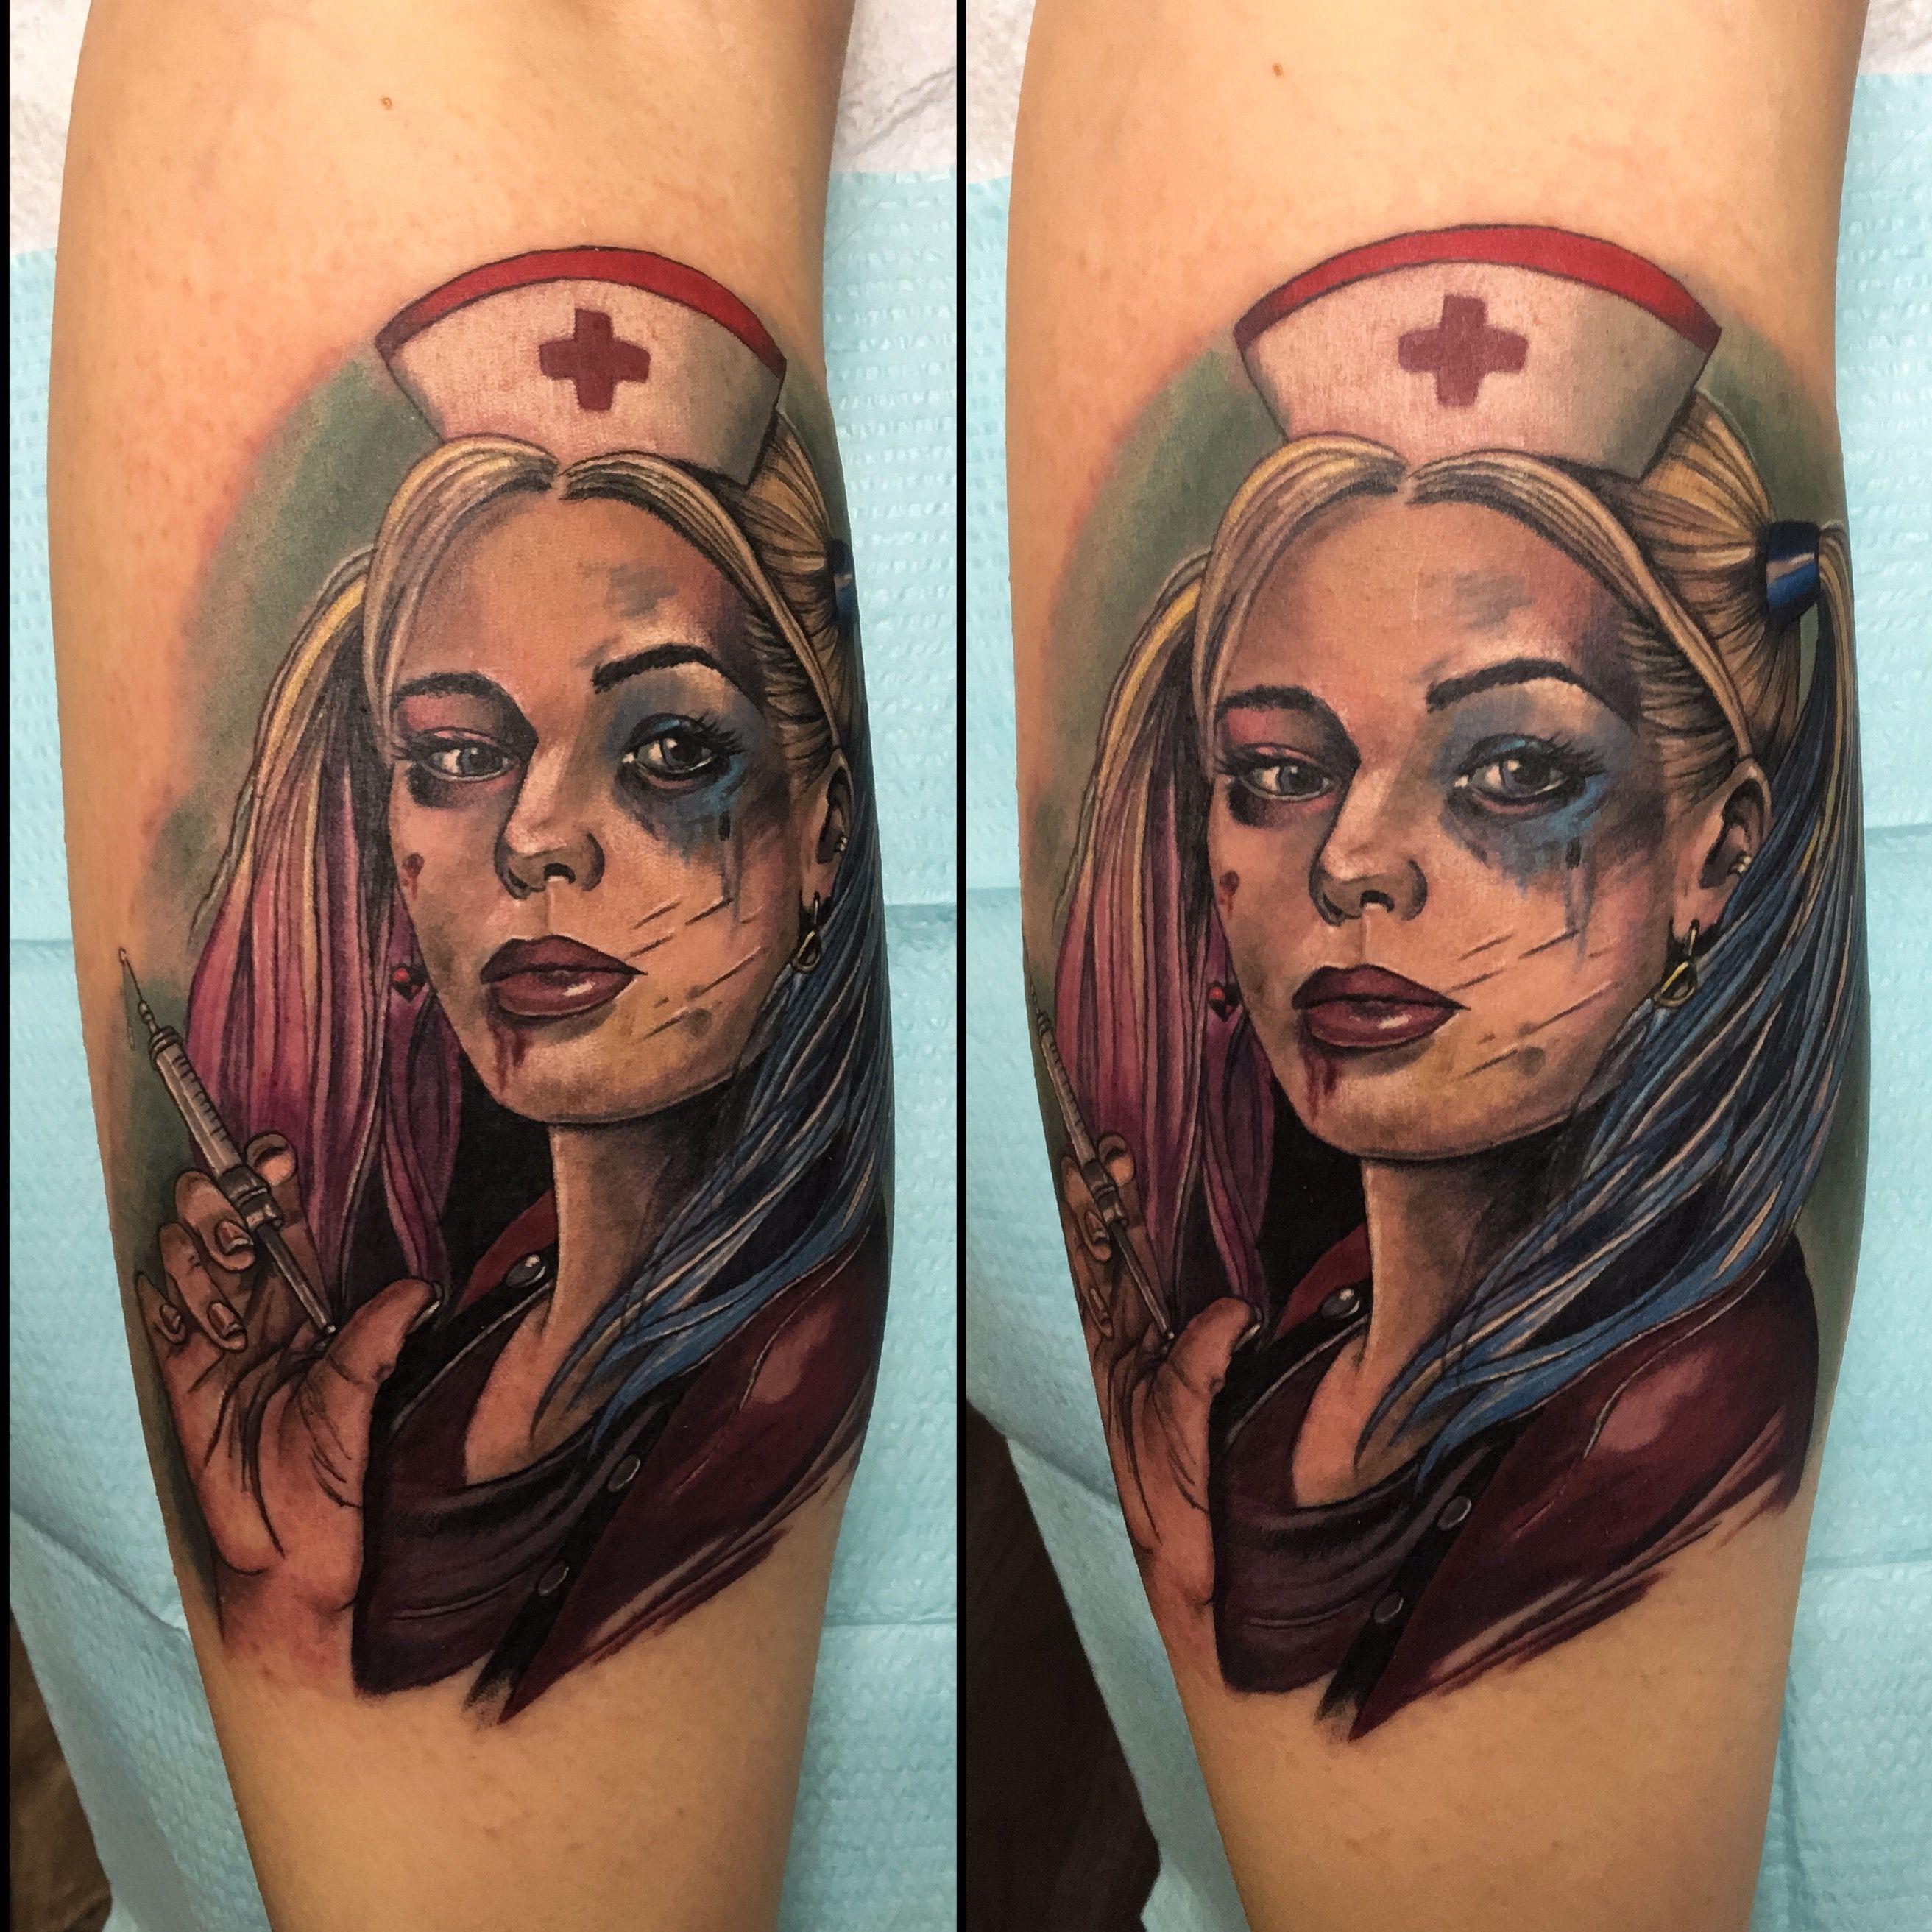 Nurse Harley Quinn tattoo by Meghan Patrick 12oz studios